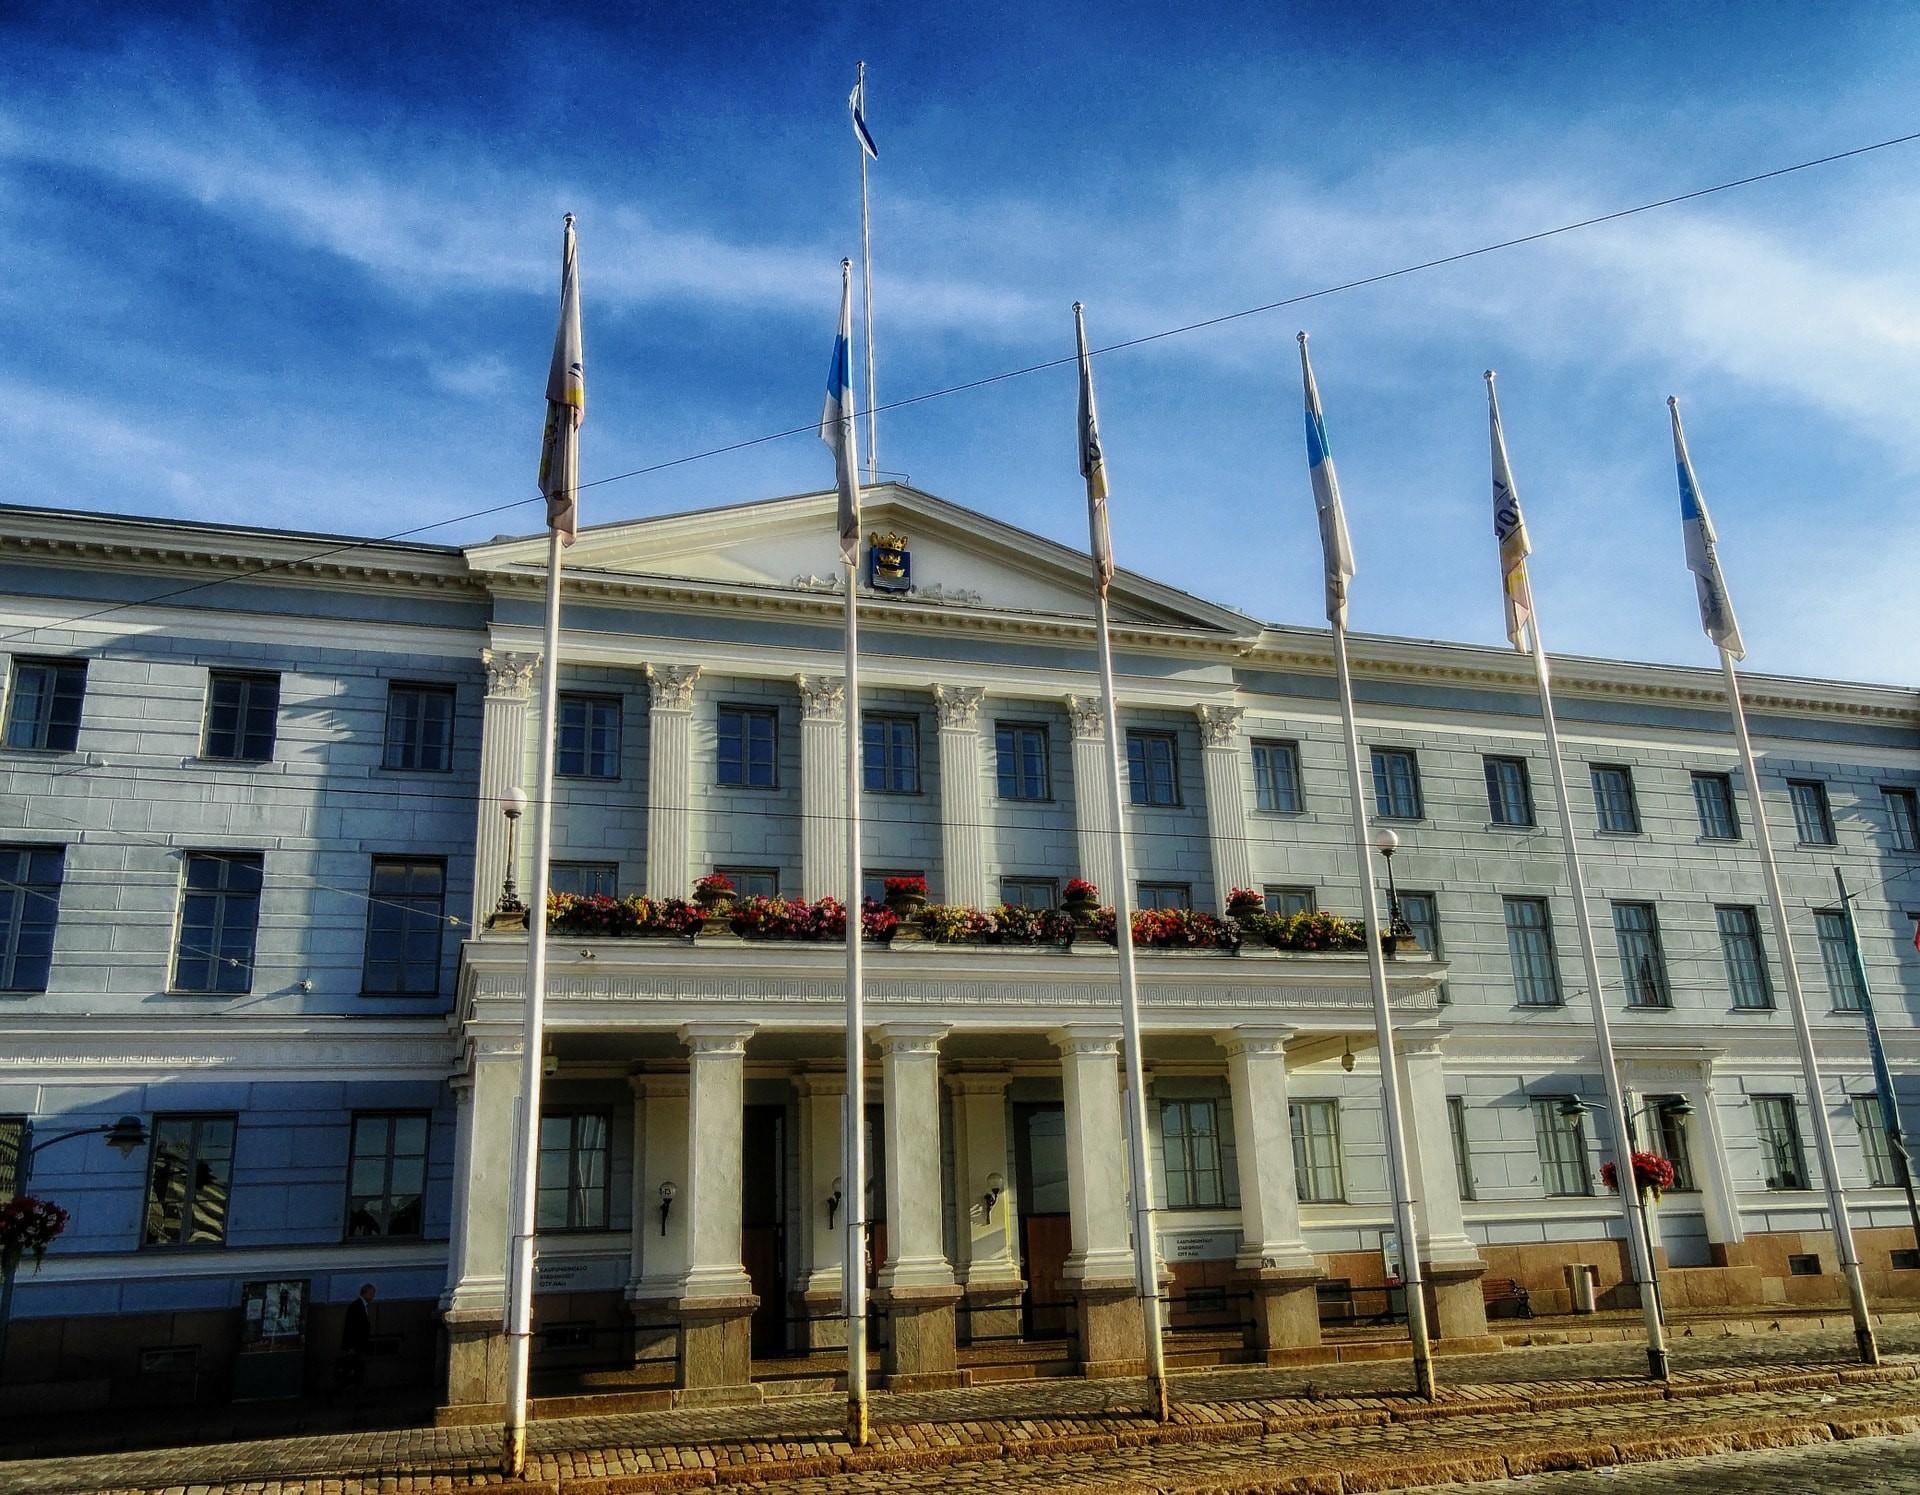 Helsinki City Hall | 12019/10279 / Pixabay